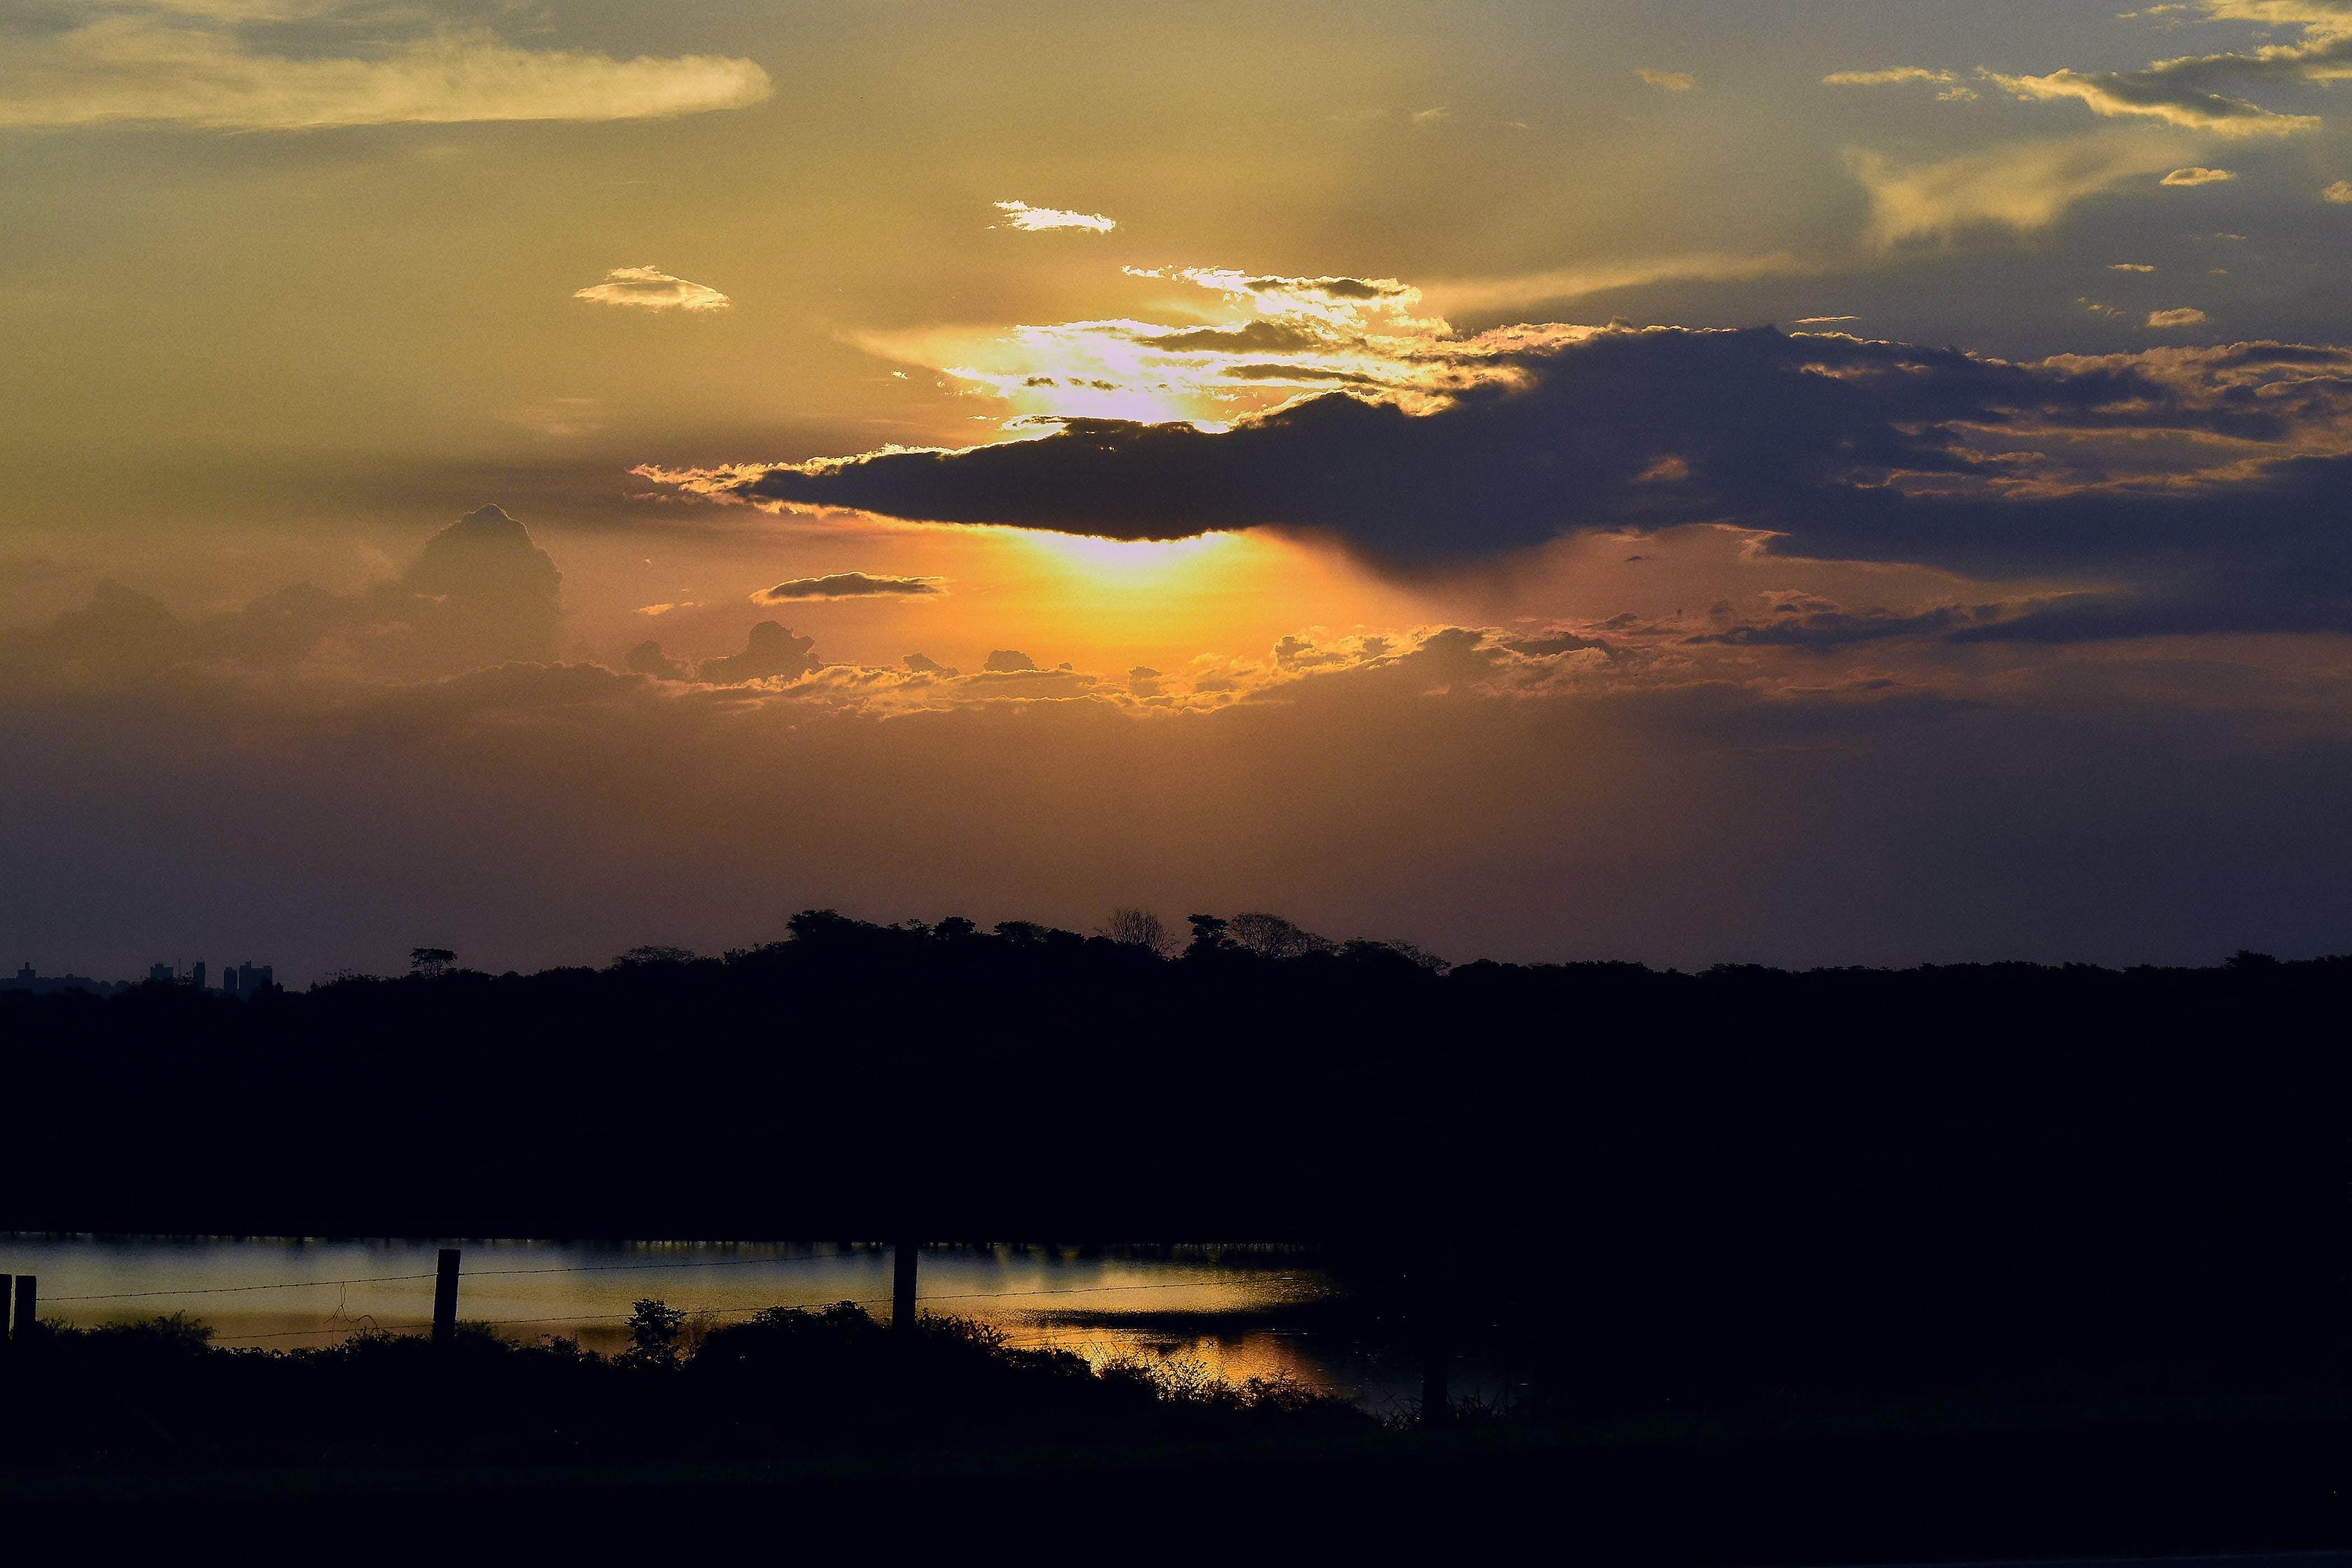 Kostenloses Stock Foto zu crepusculo, entdieter, lago, natureza